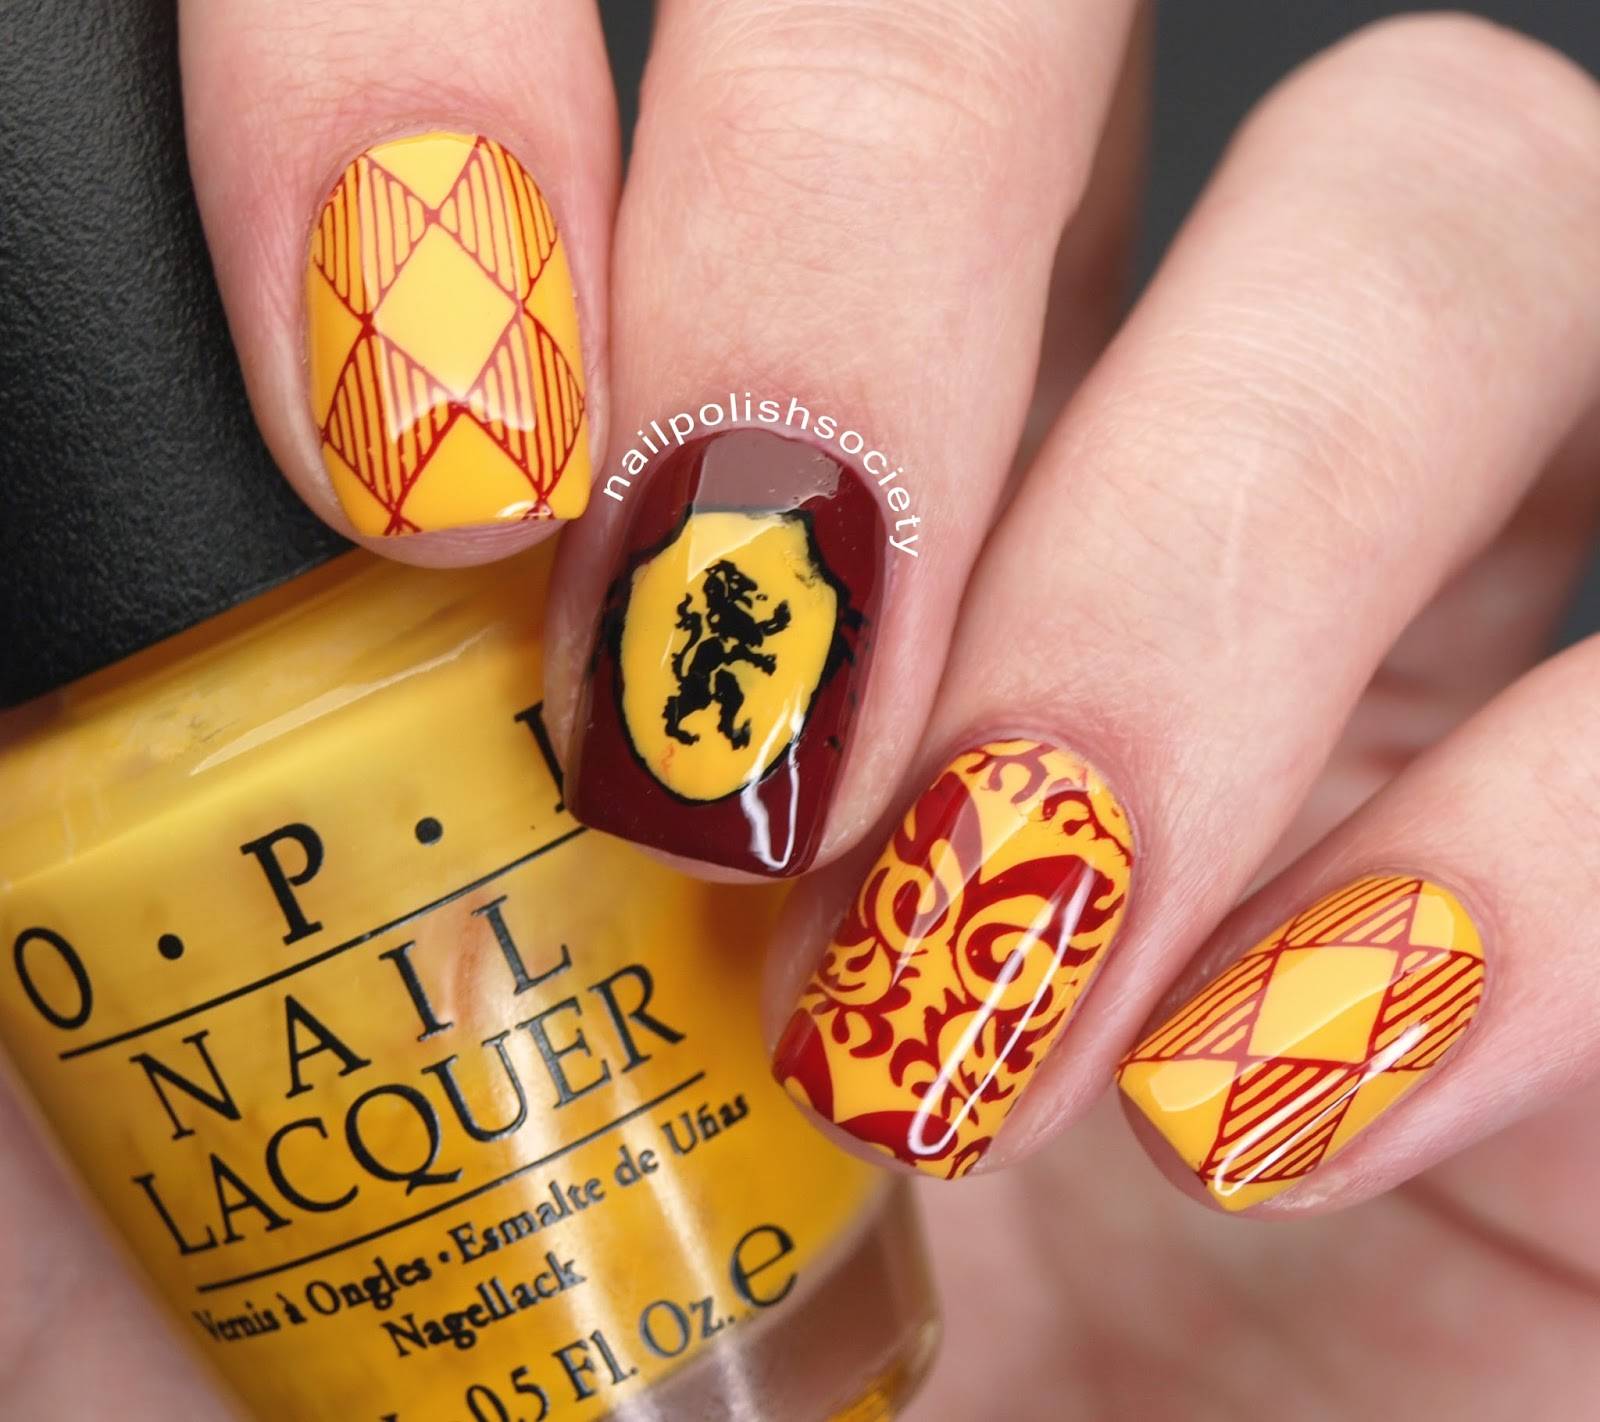 Nail polish society 40 great nail art ideas films and hehe 40 great nail art ideas films and hehe stamping plate review prinsesfo Choice Image